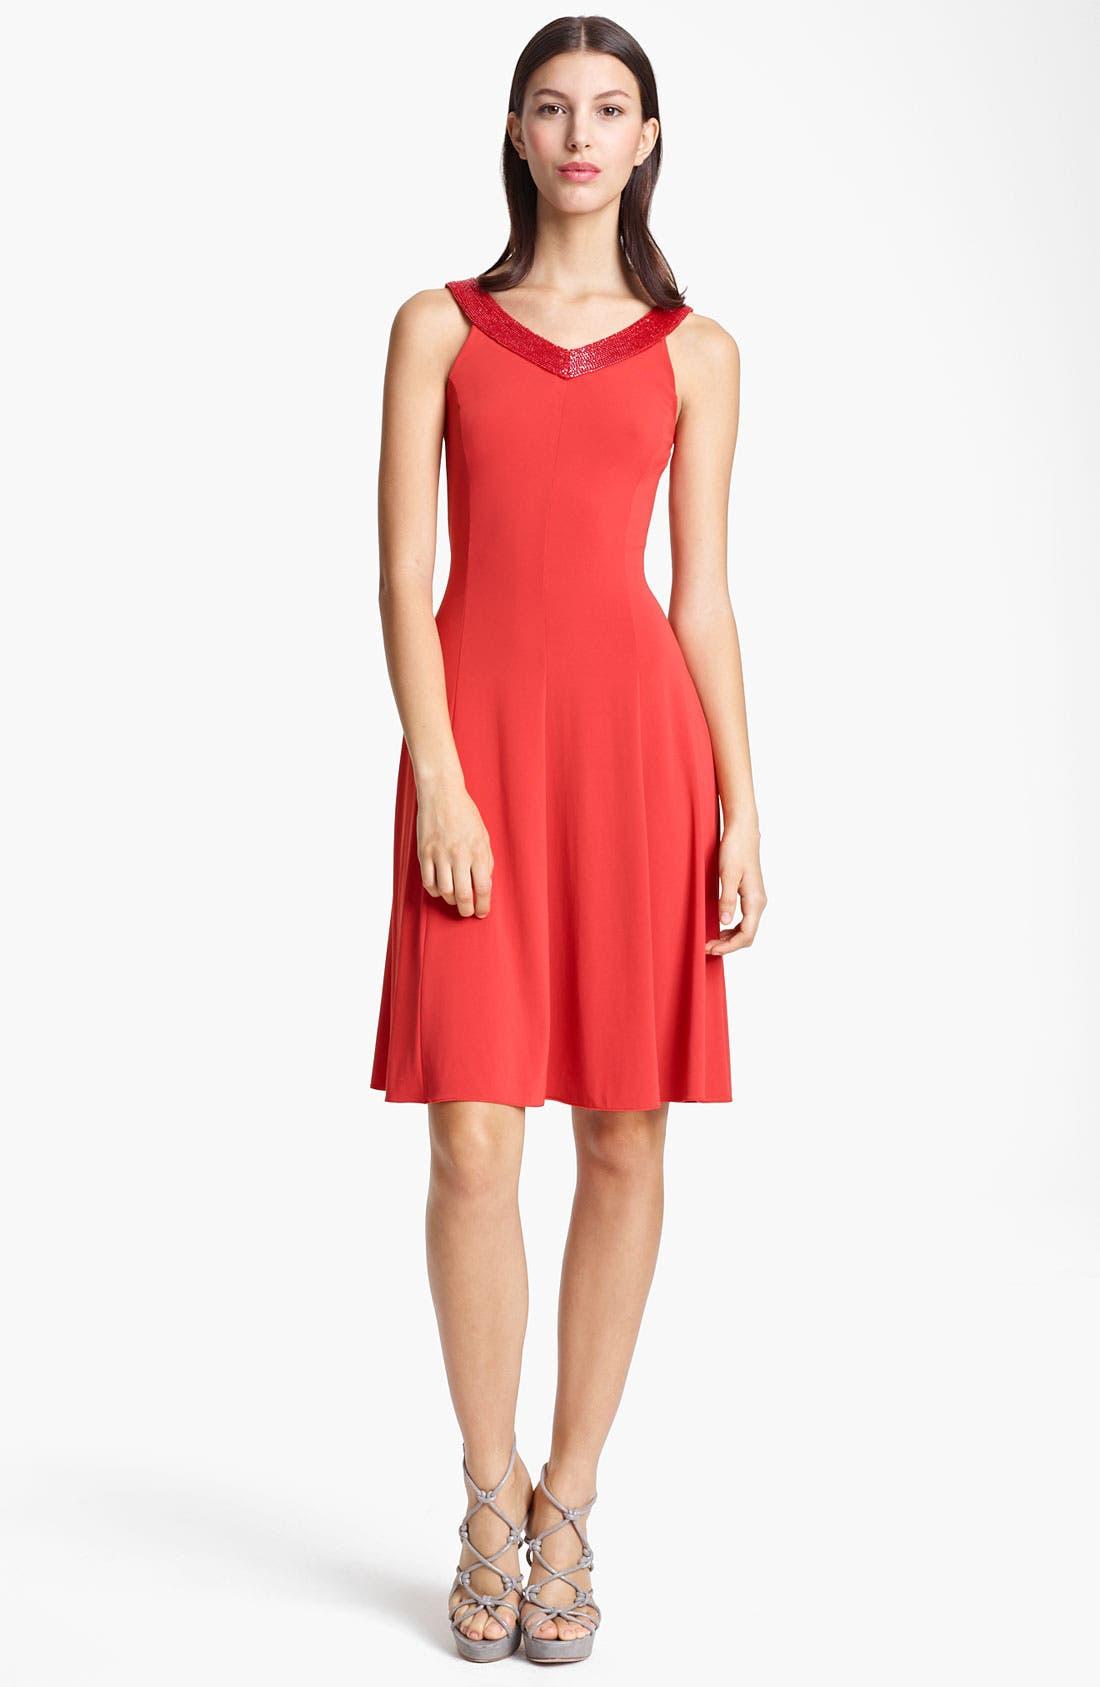 Alternate Image 1 Selected - Armani Collezioni Beaded Neckline Cocktail Dress